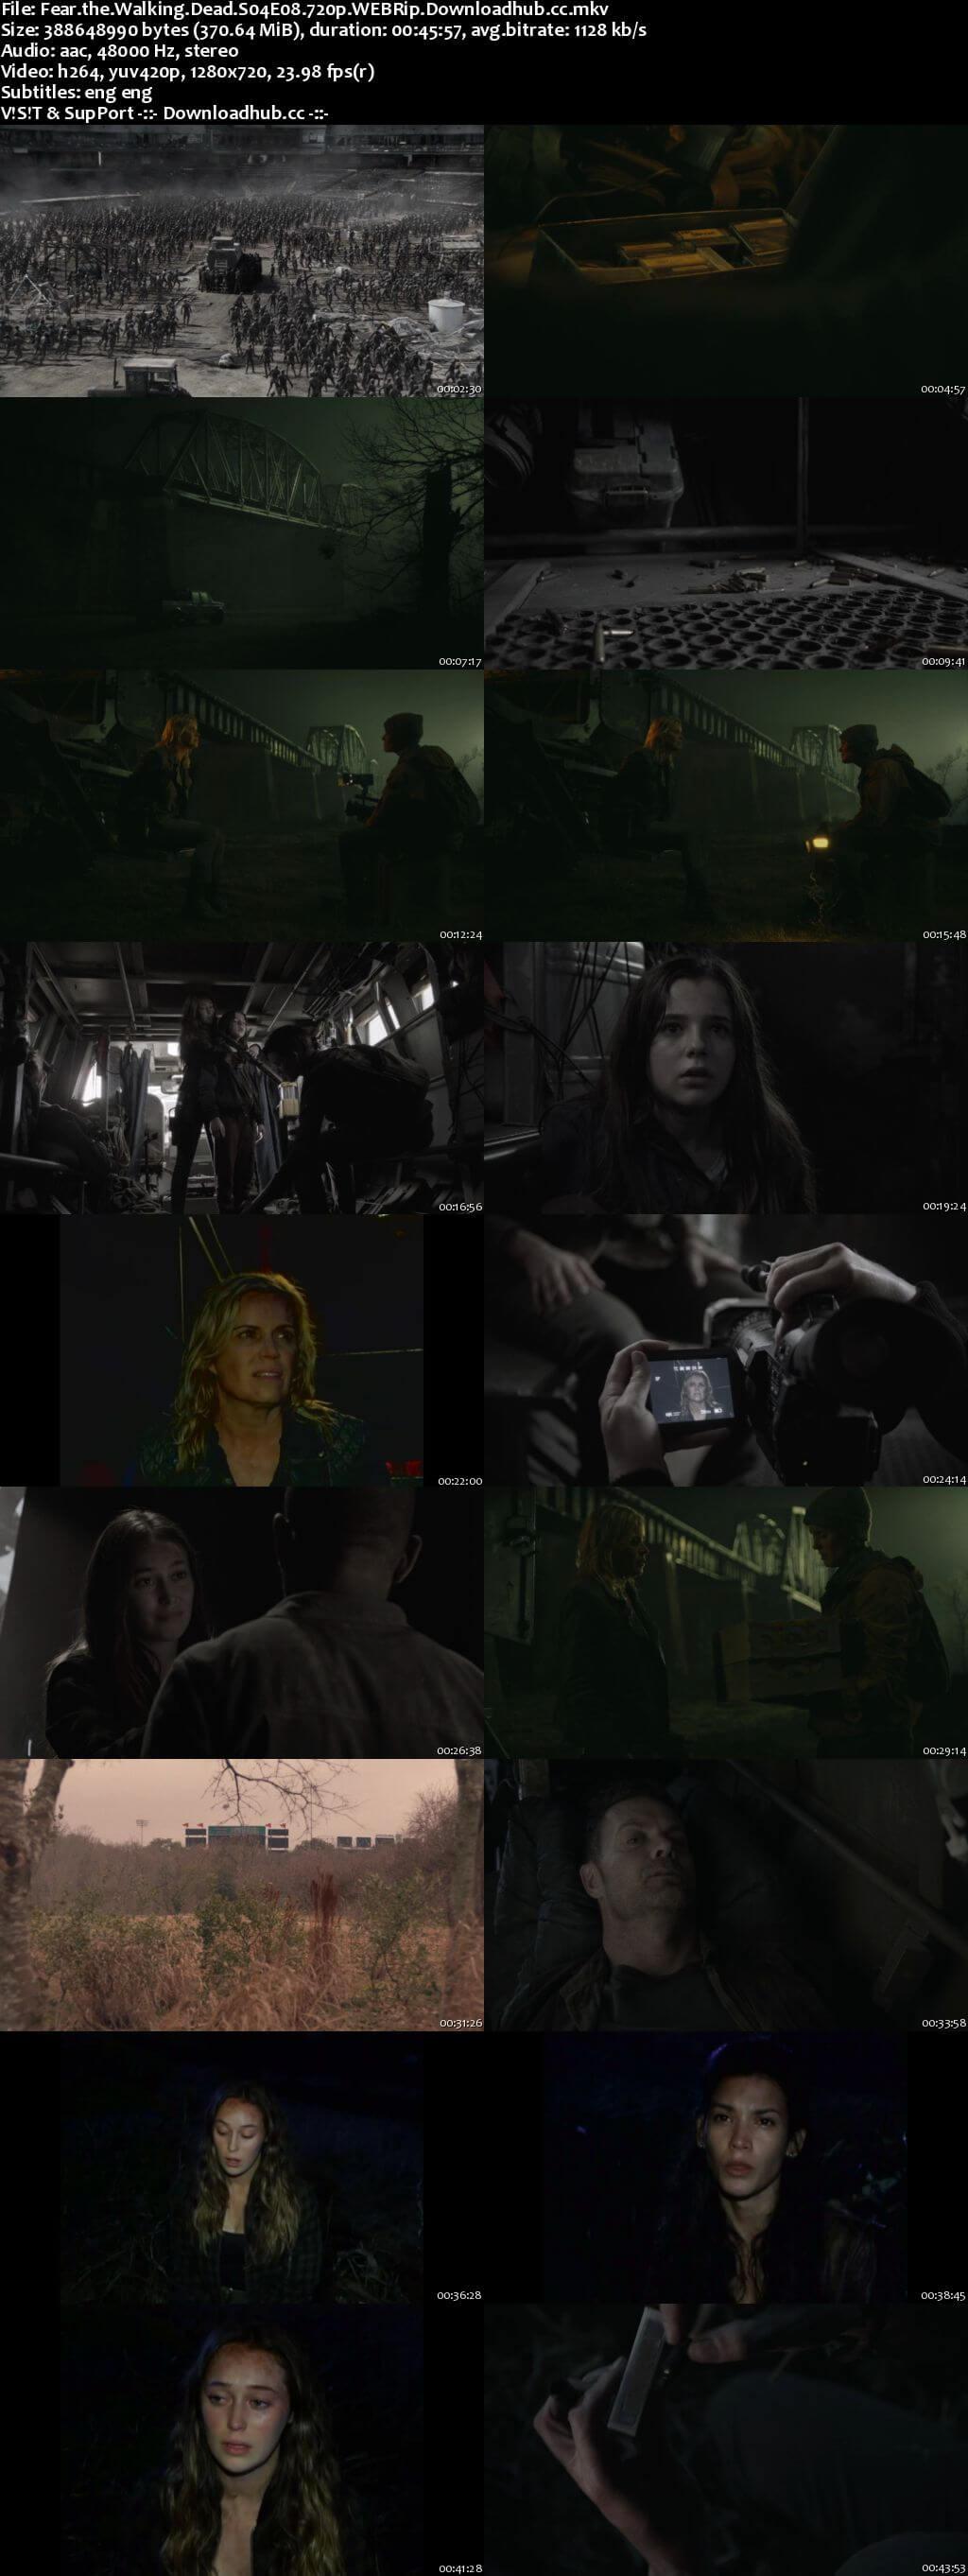 Fear the Walking Dead S04E08 350MB WEBRip 720p x264 ESubs